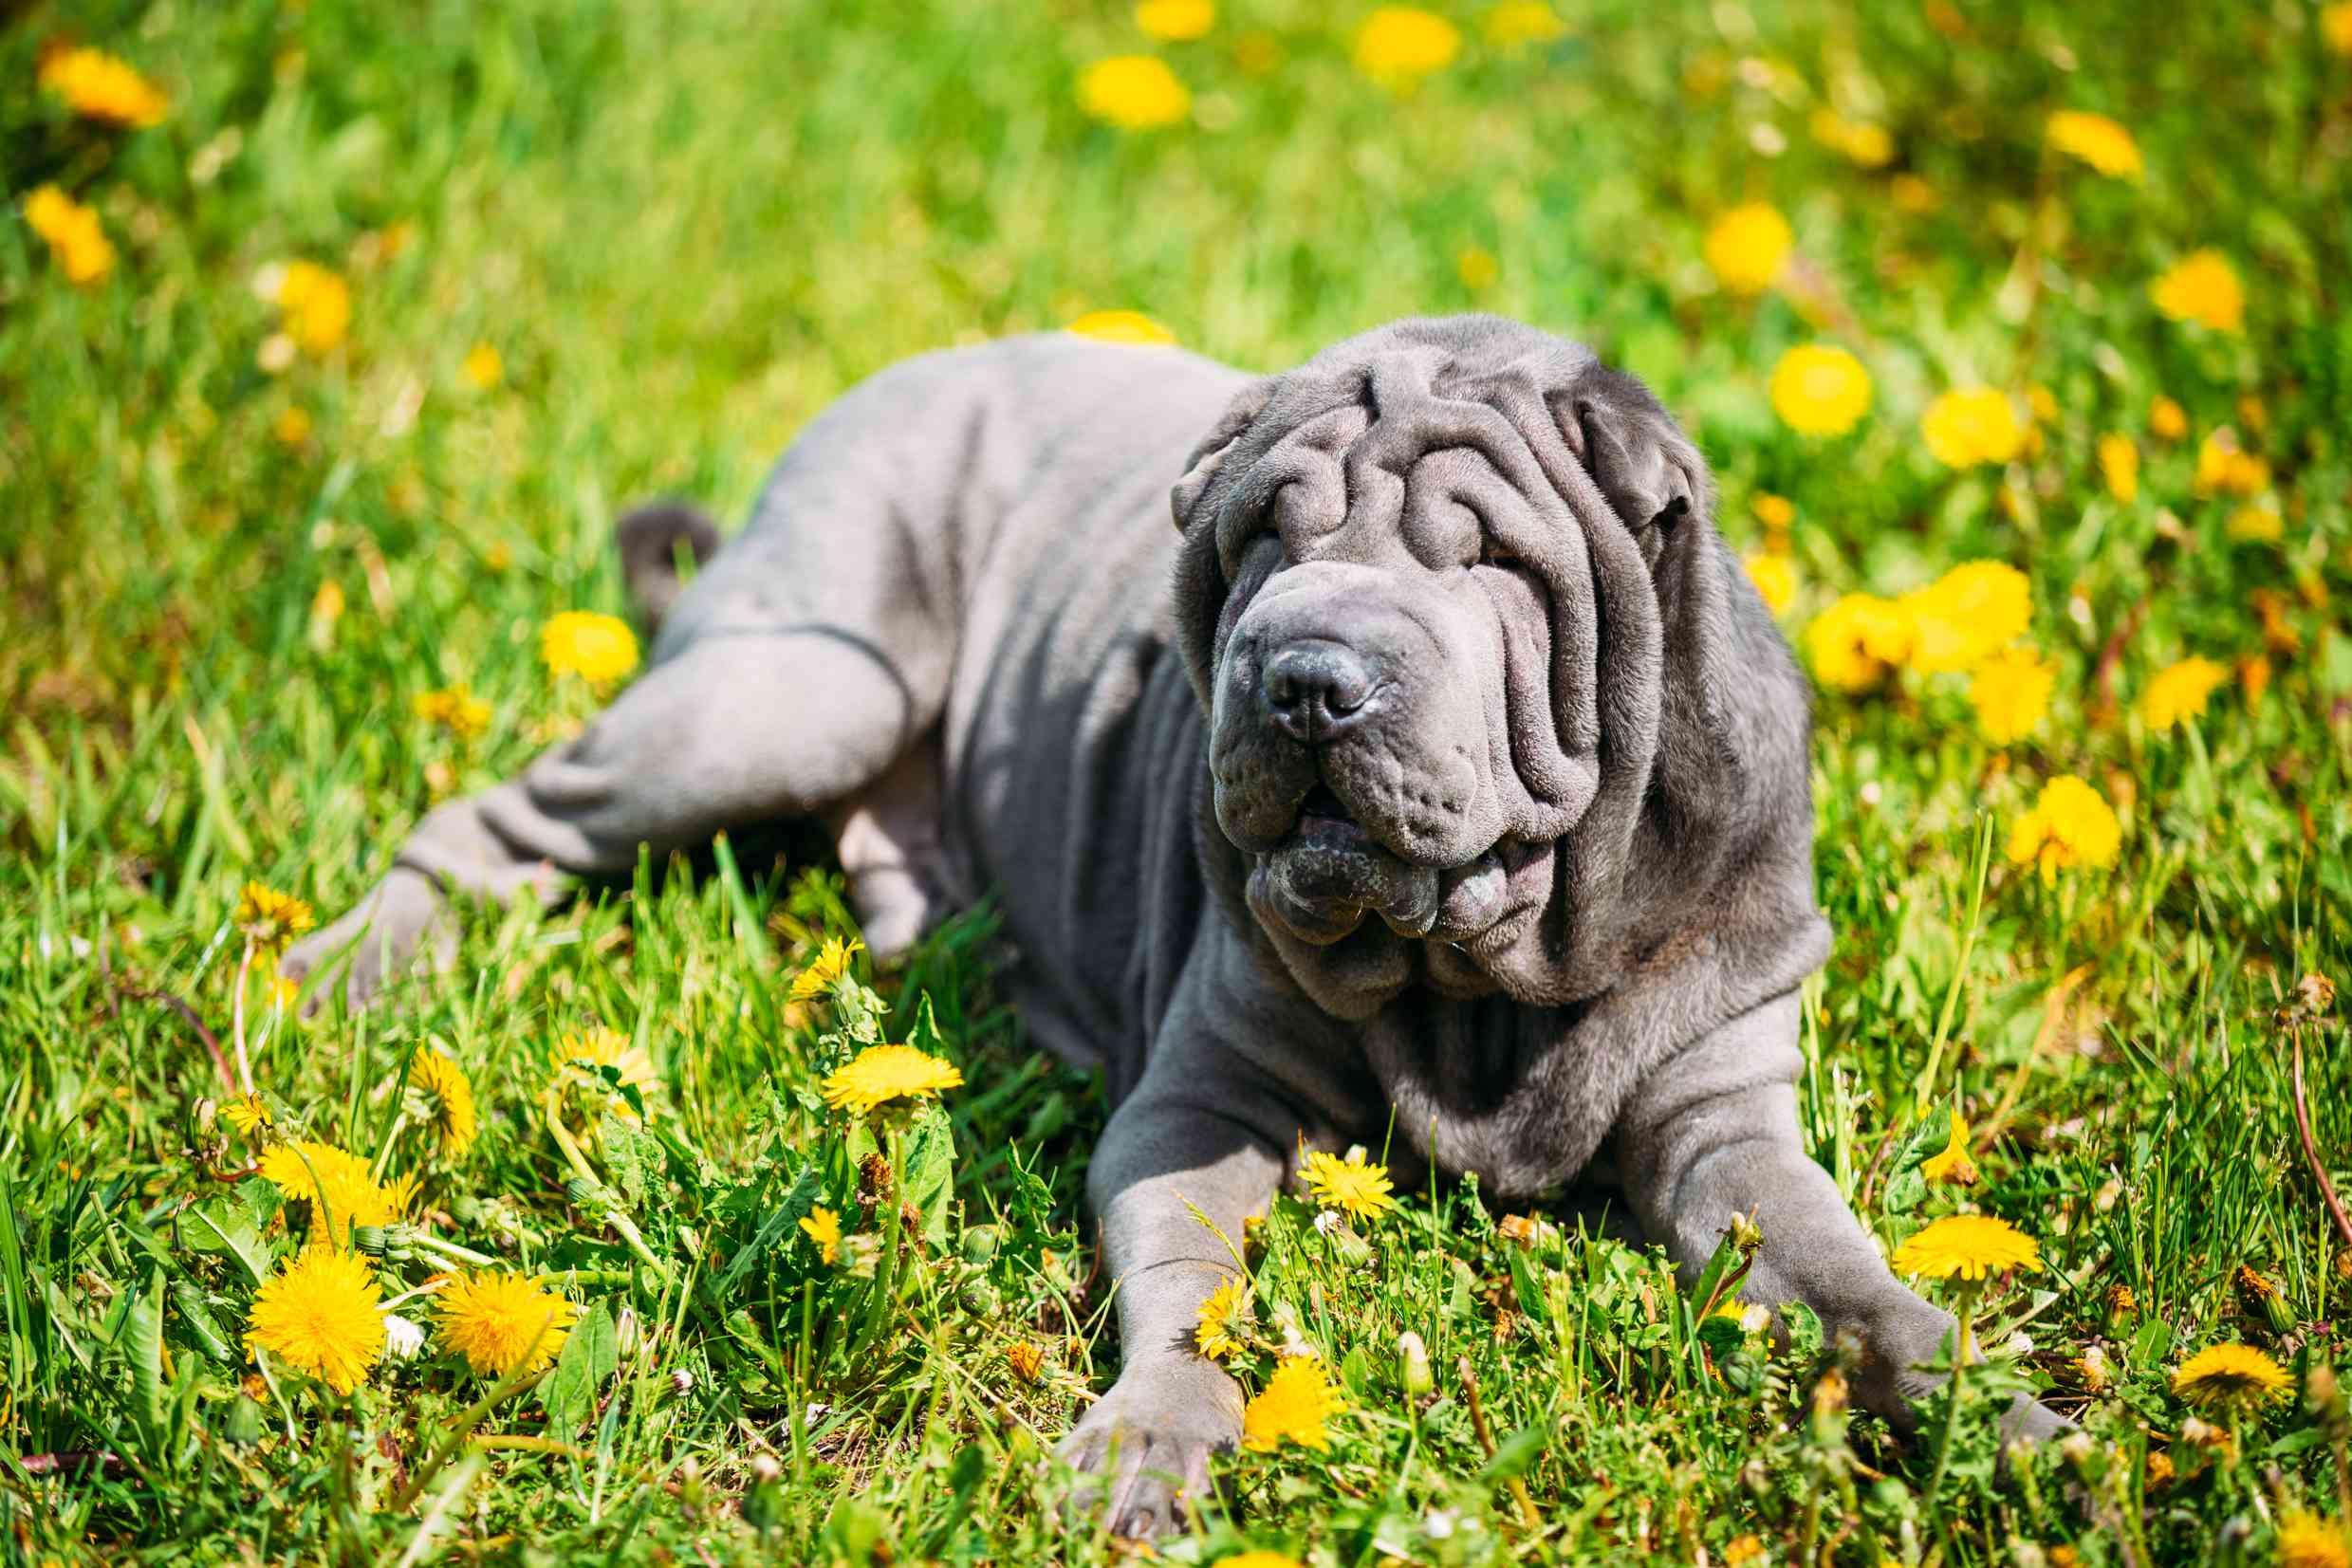 Blue Shar-Pei dog